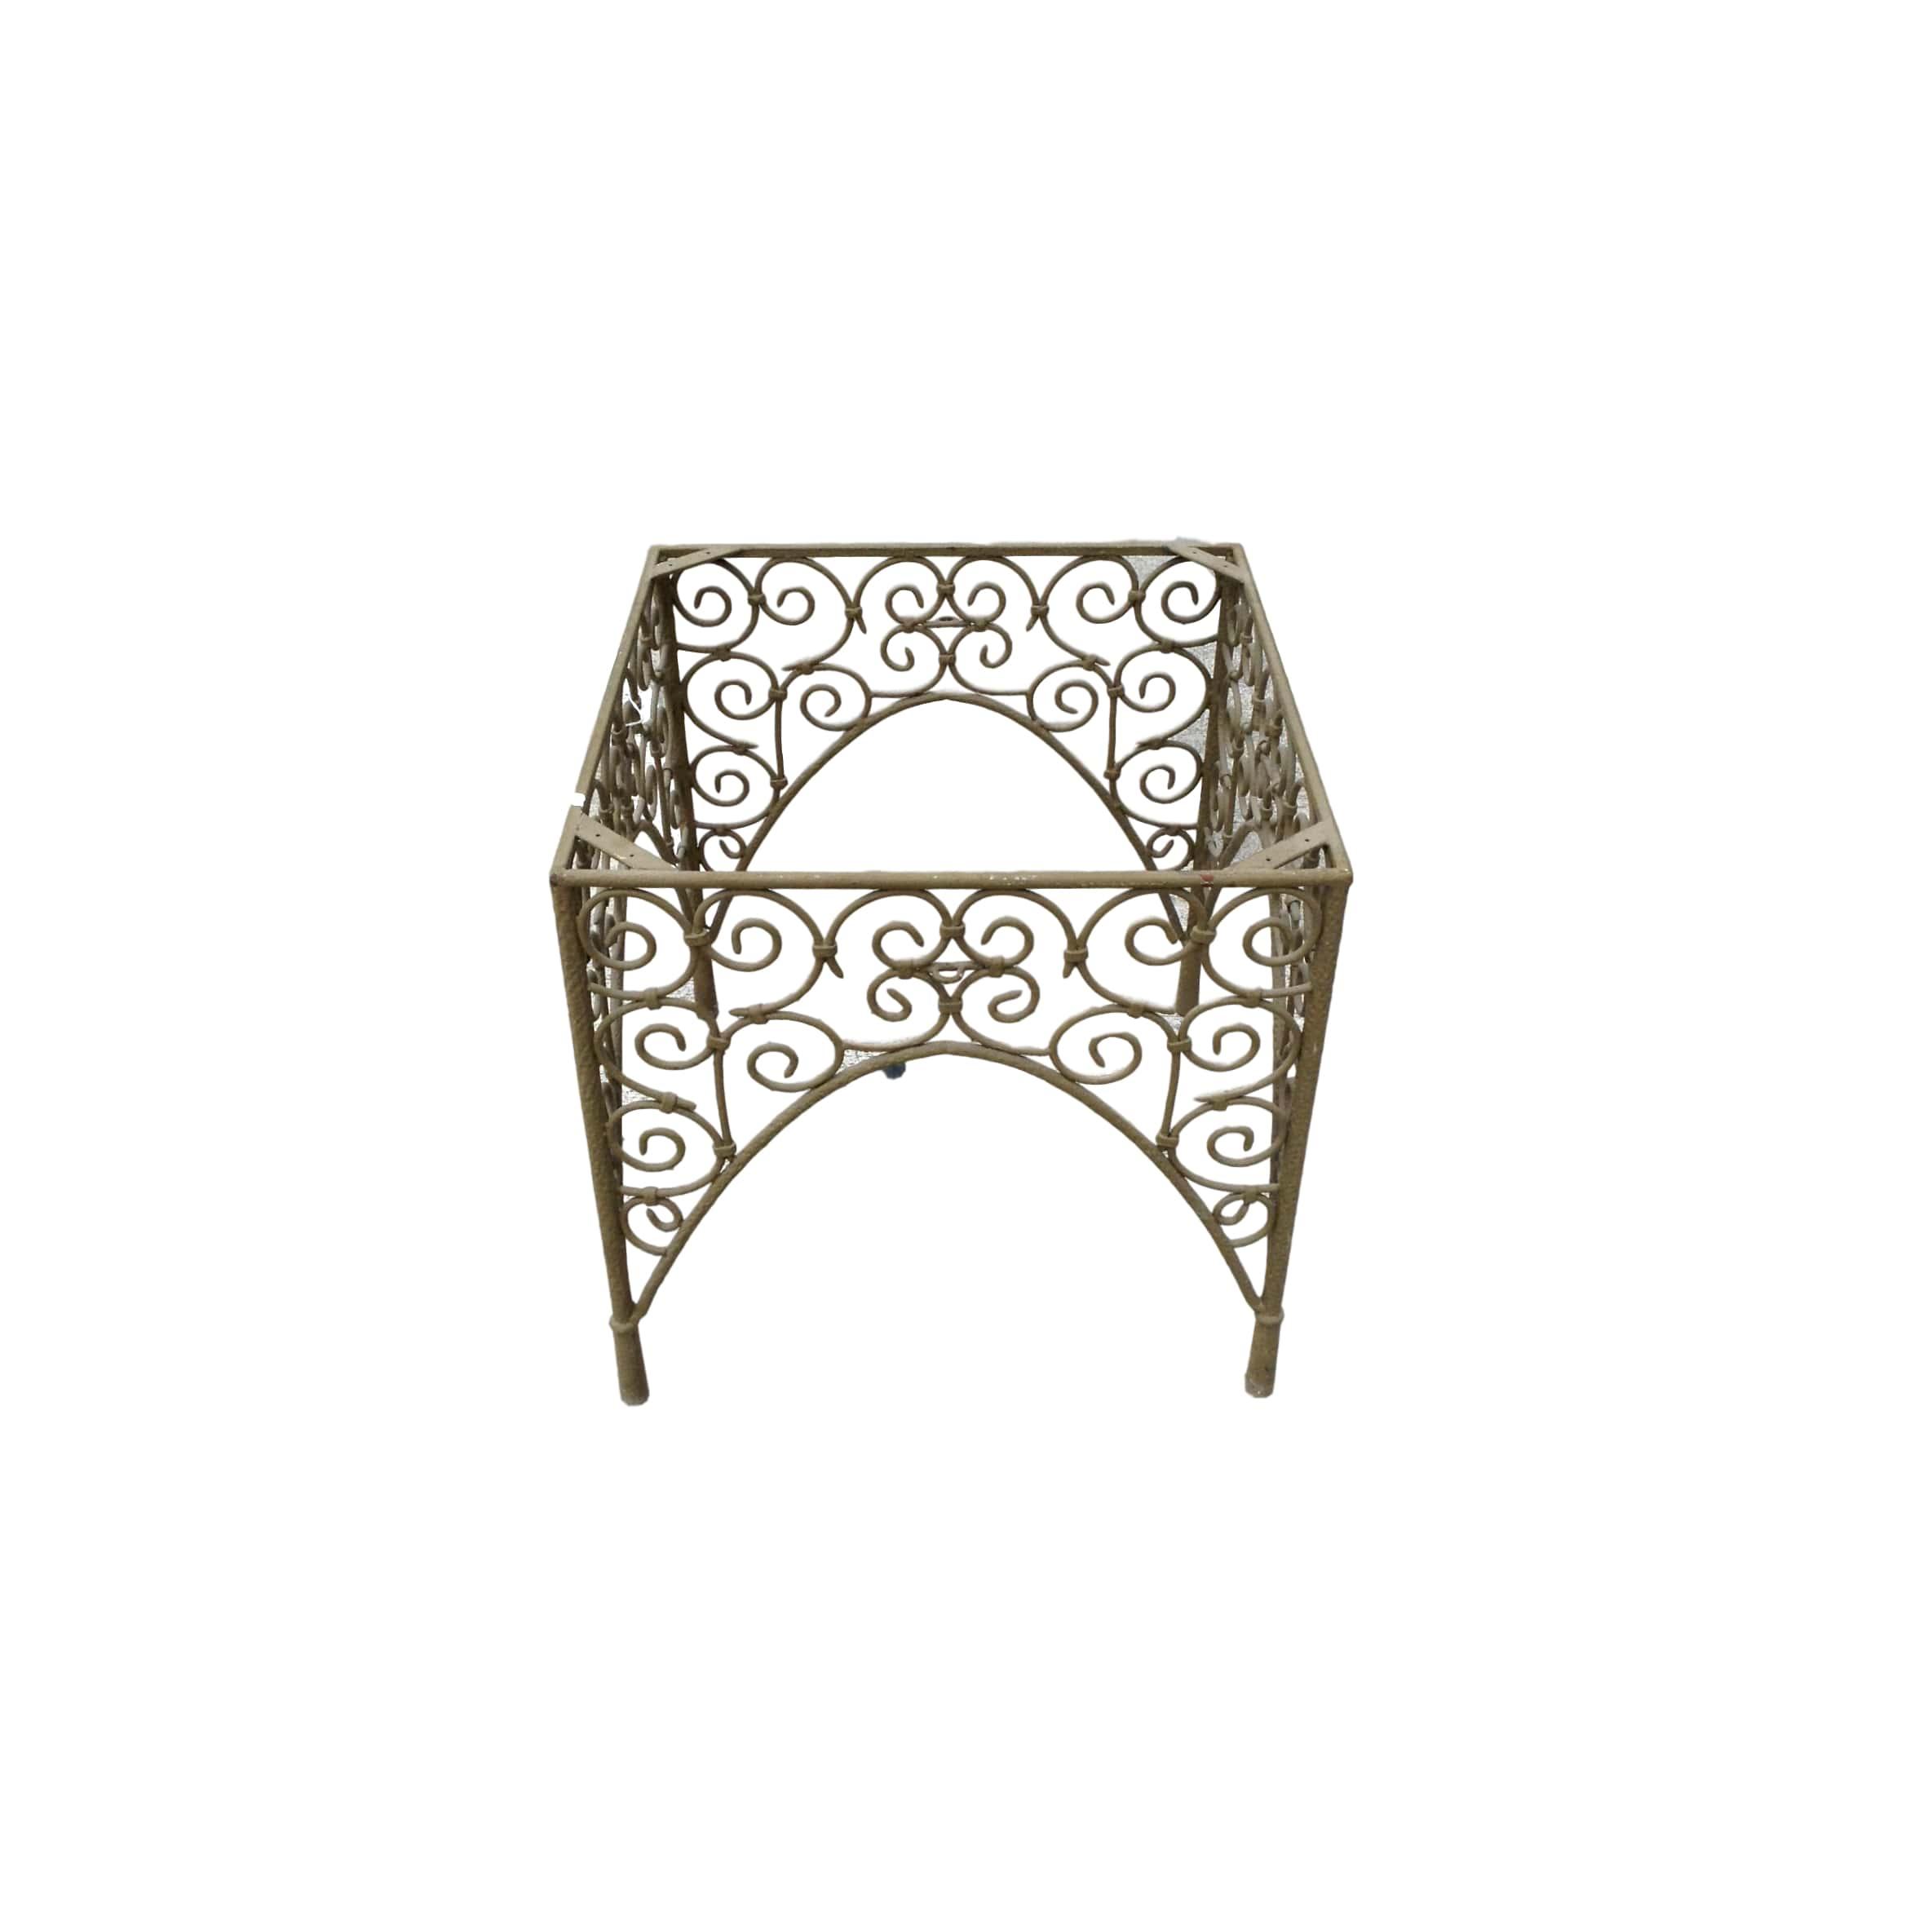 Cast Metal End Table Base